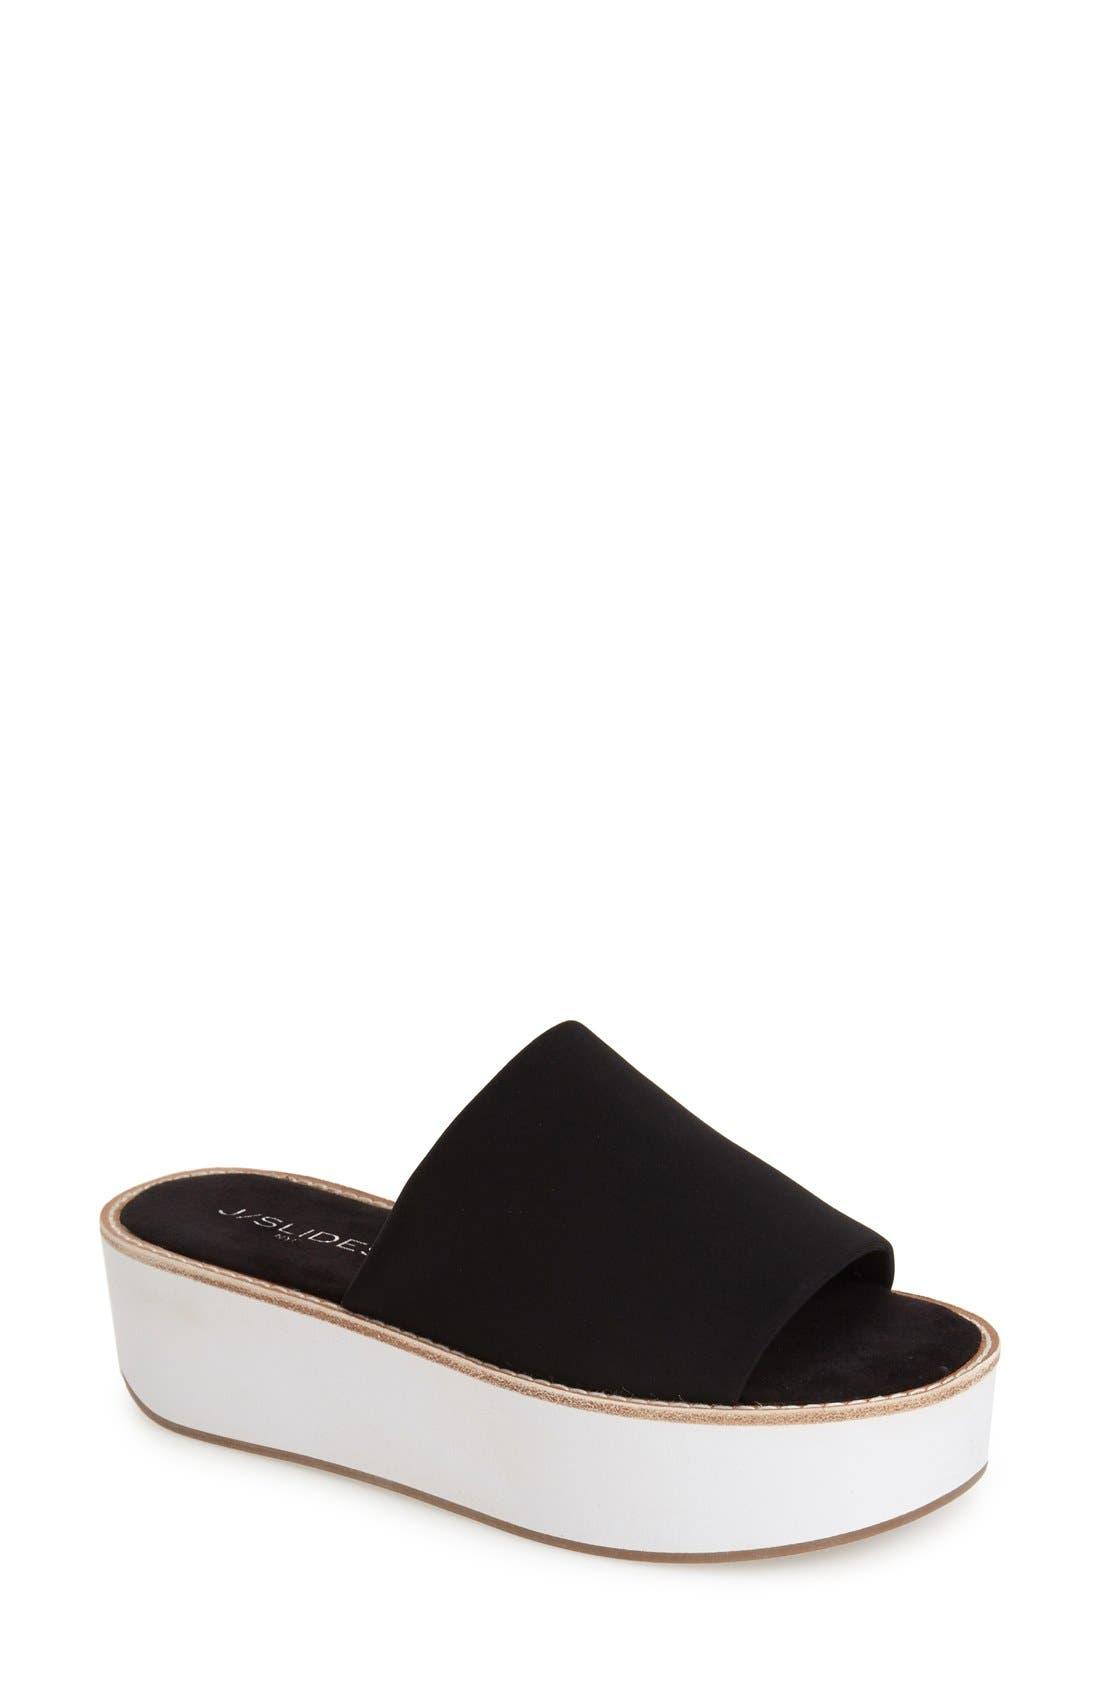 Main Image - JSlides 'Blinky' Flatform Slide Sandal (Women)